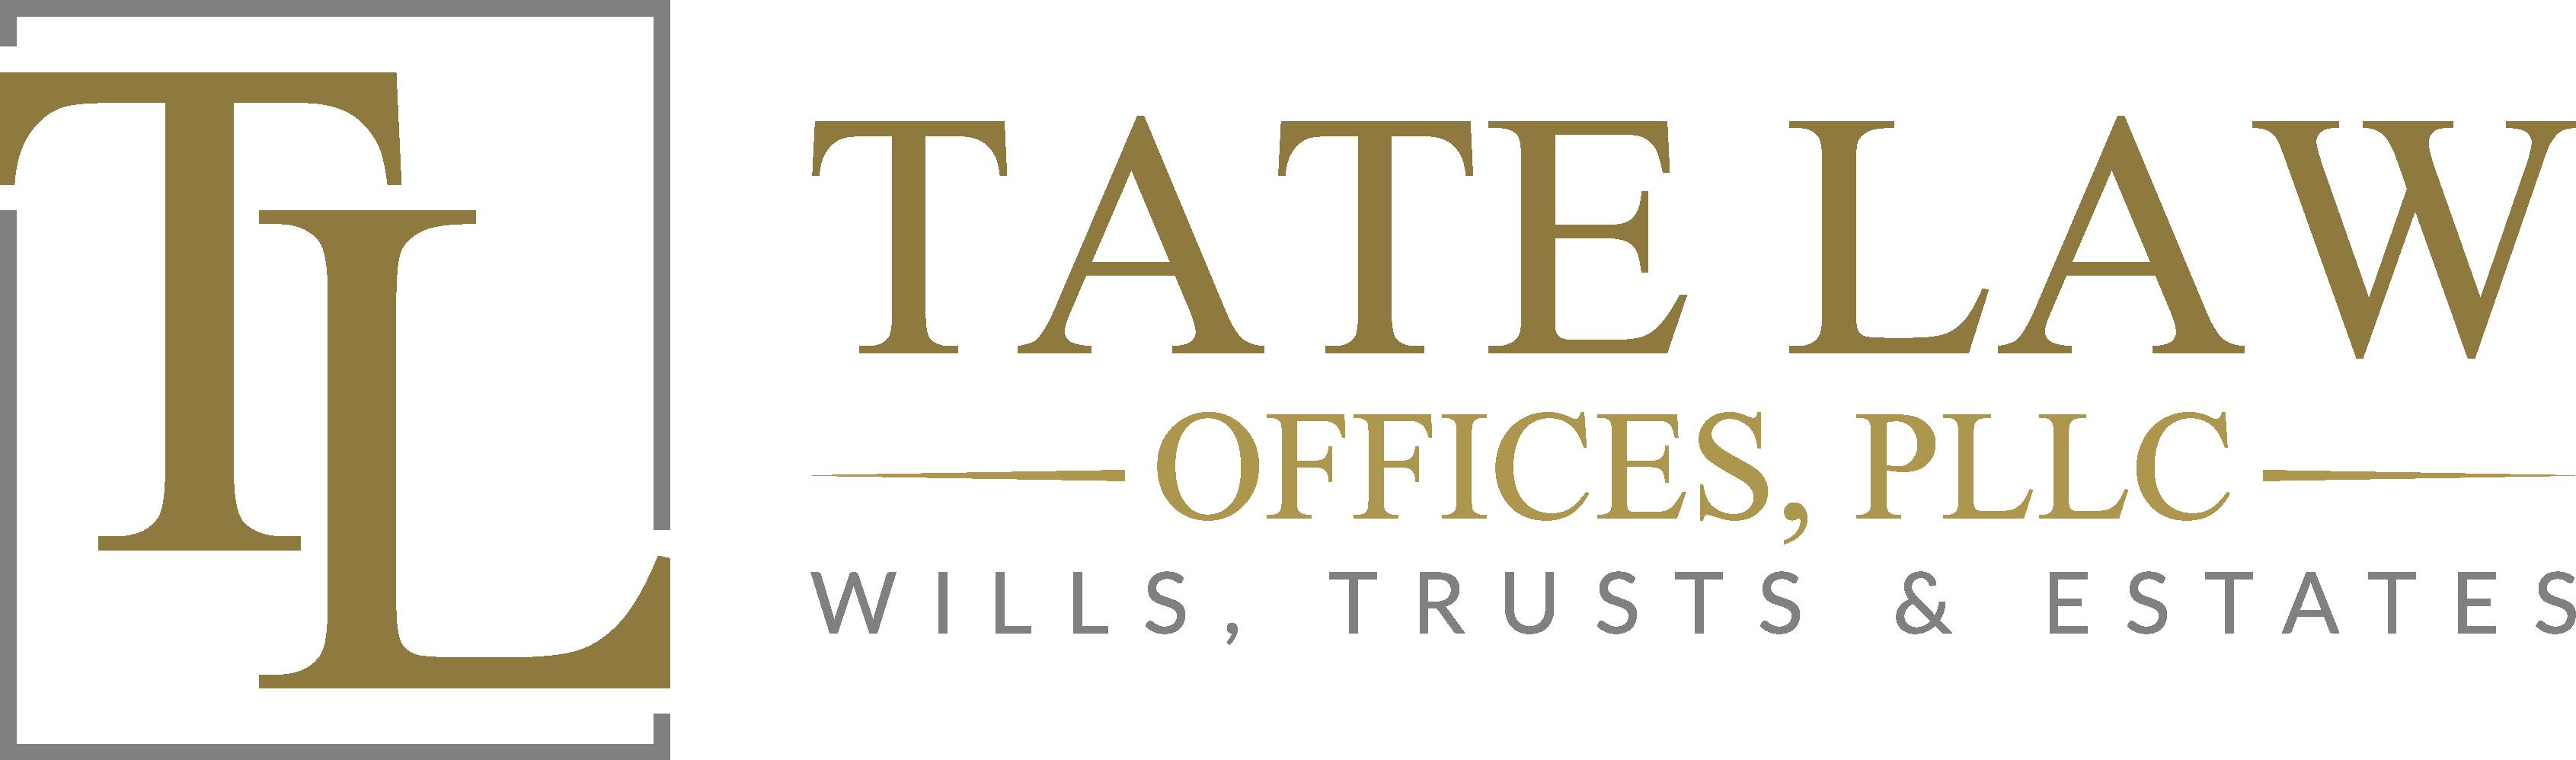 Tate Law